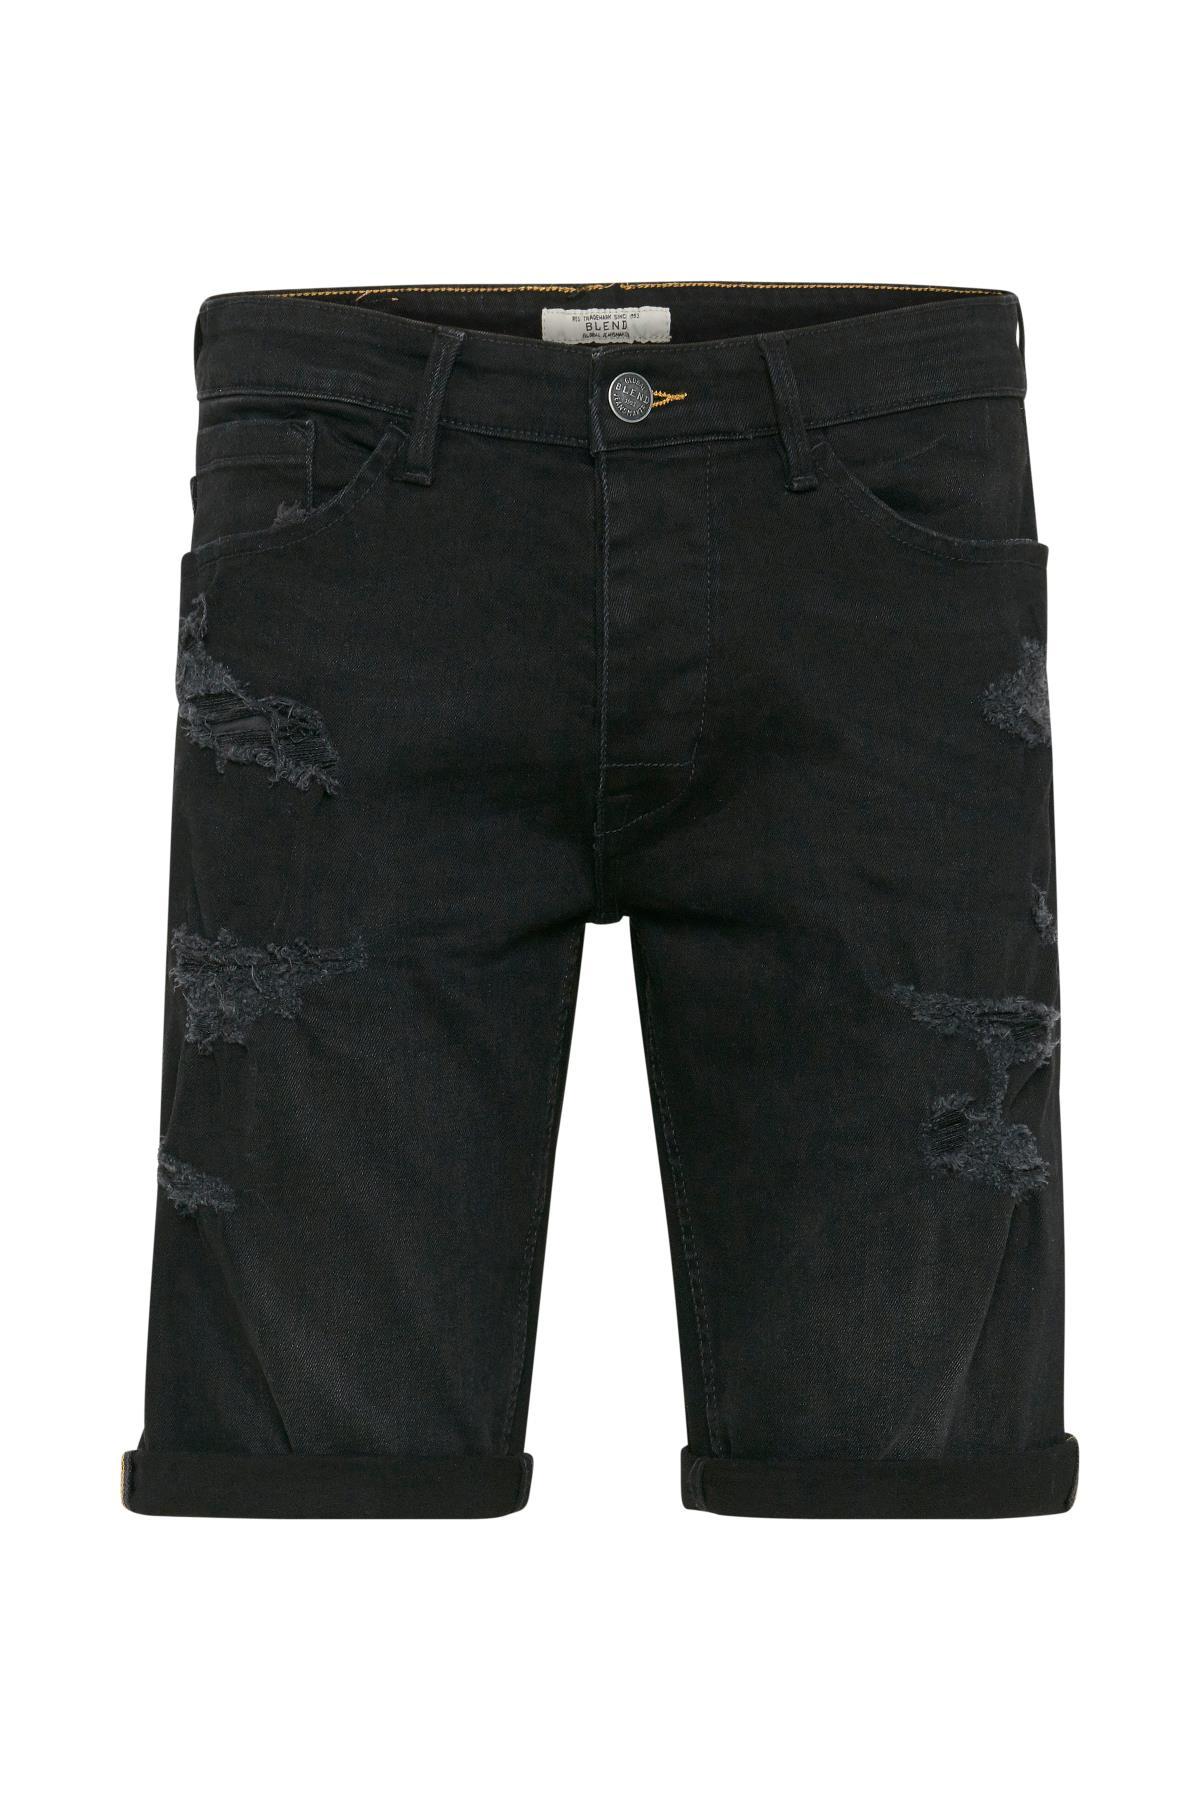 Denim Black Denimshorts – Køb Denim Black Denimshorts fra str. S-XL her